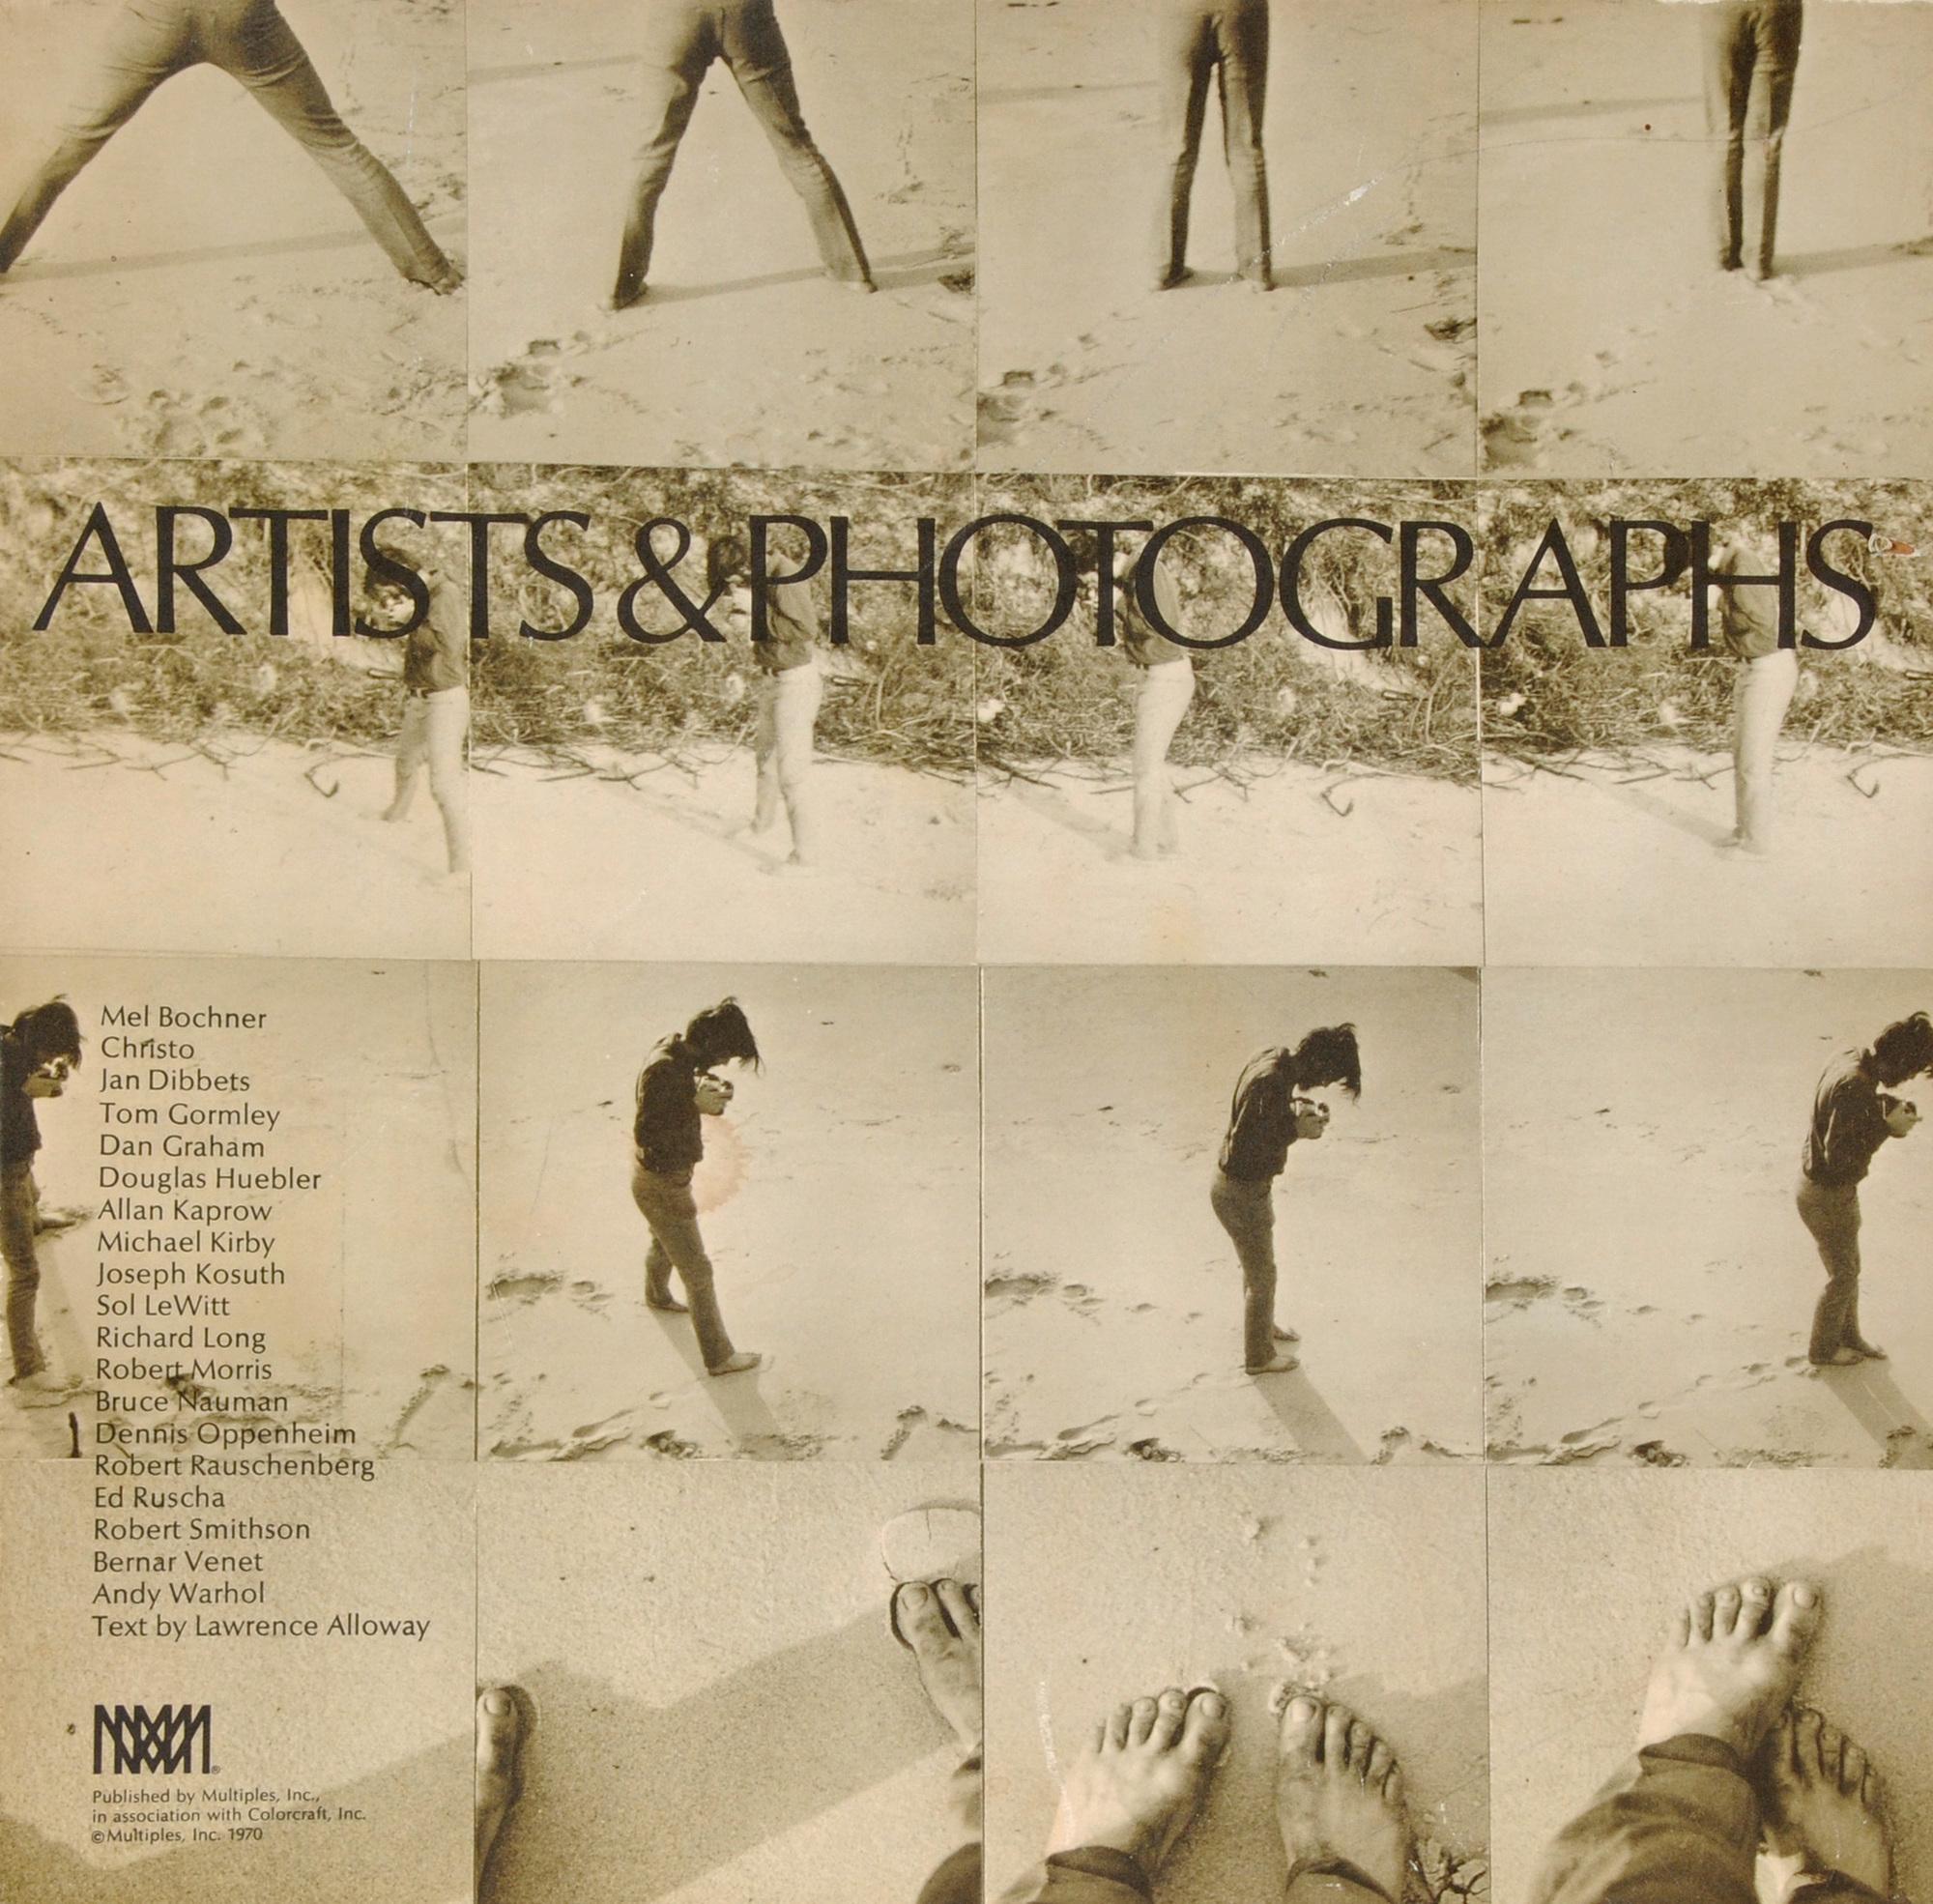 Portfolio, Artists & Photographs